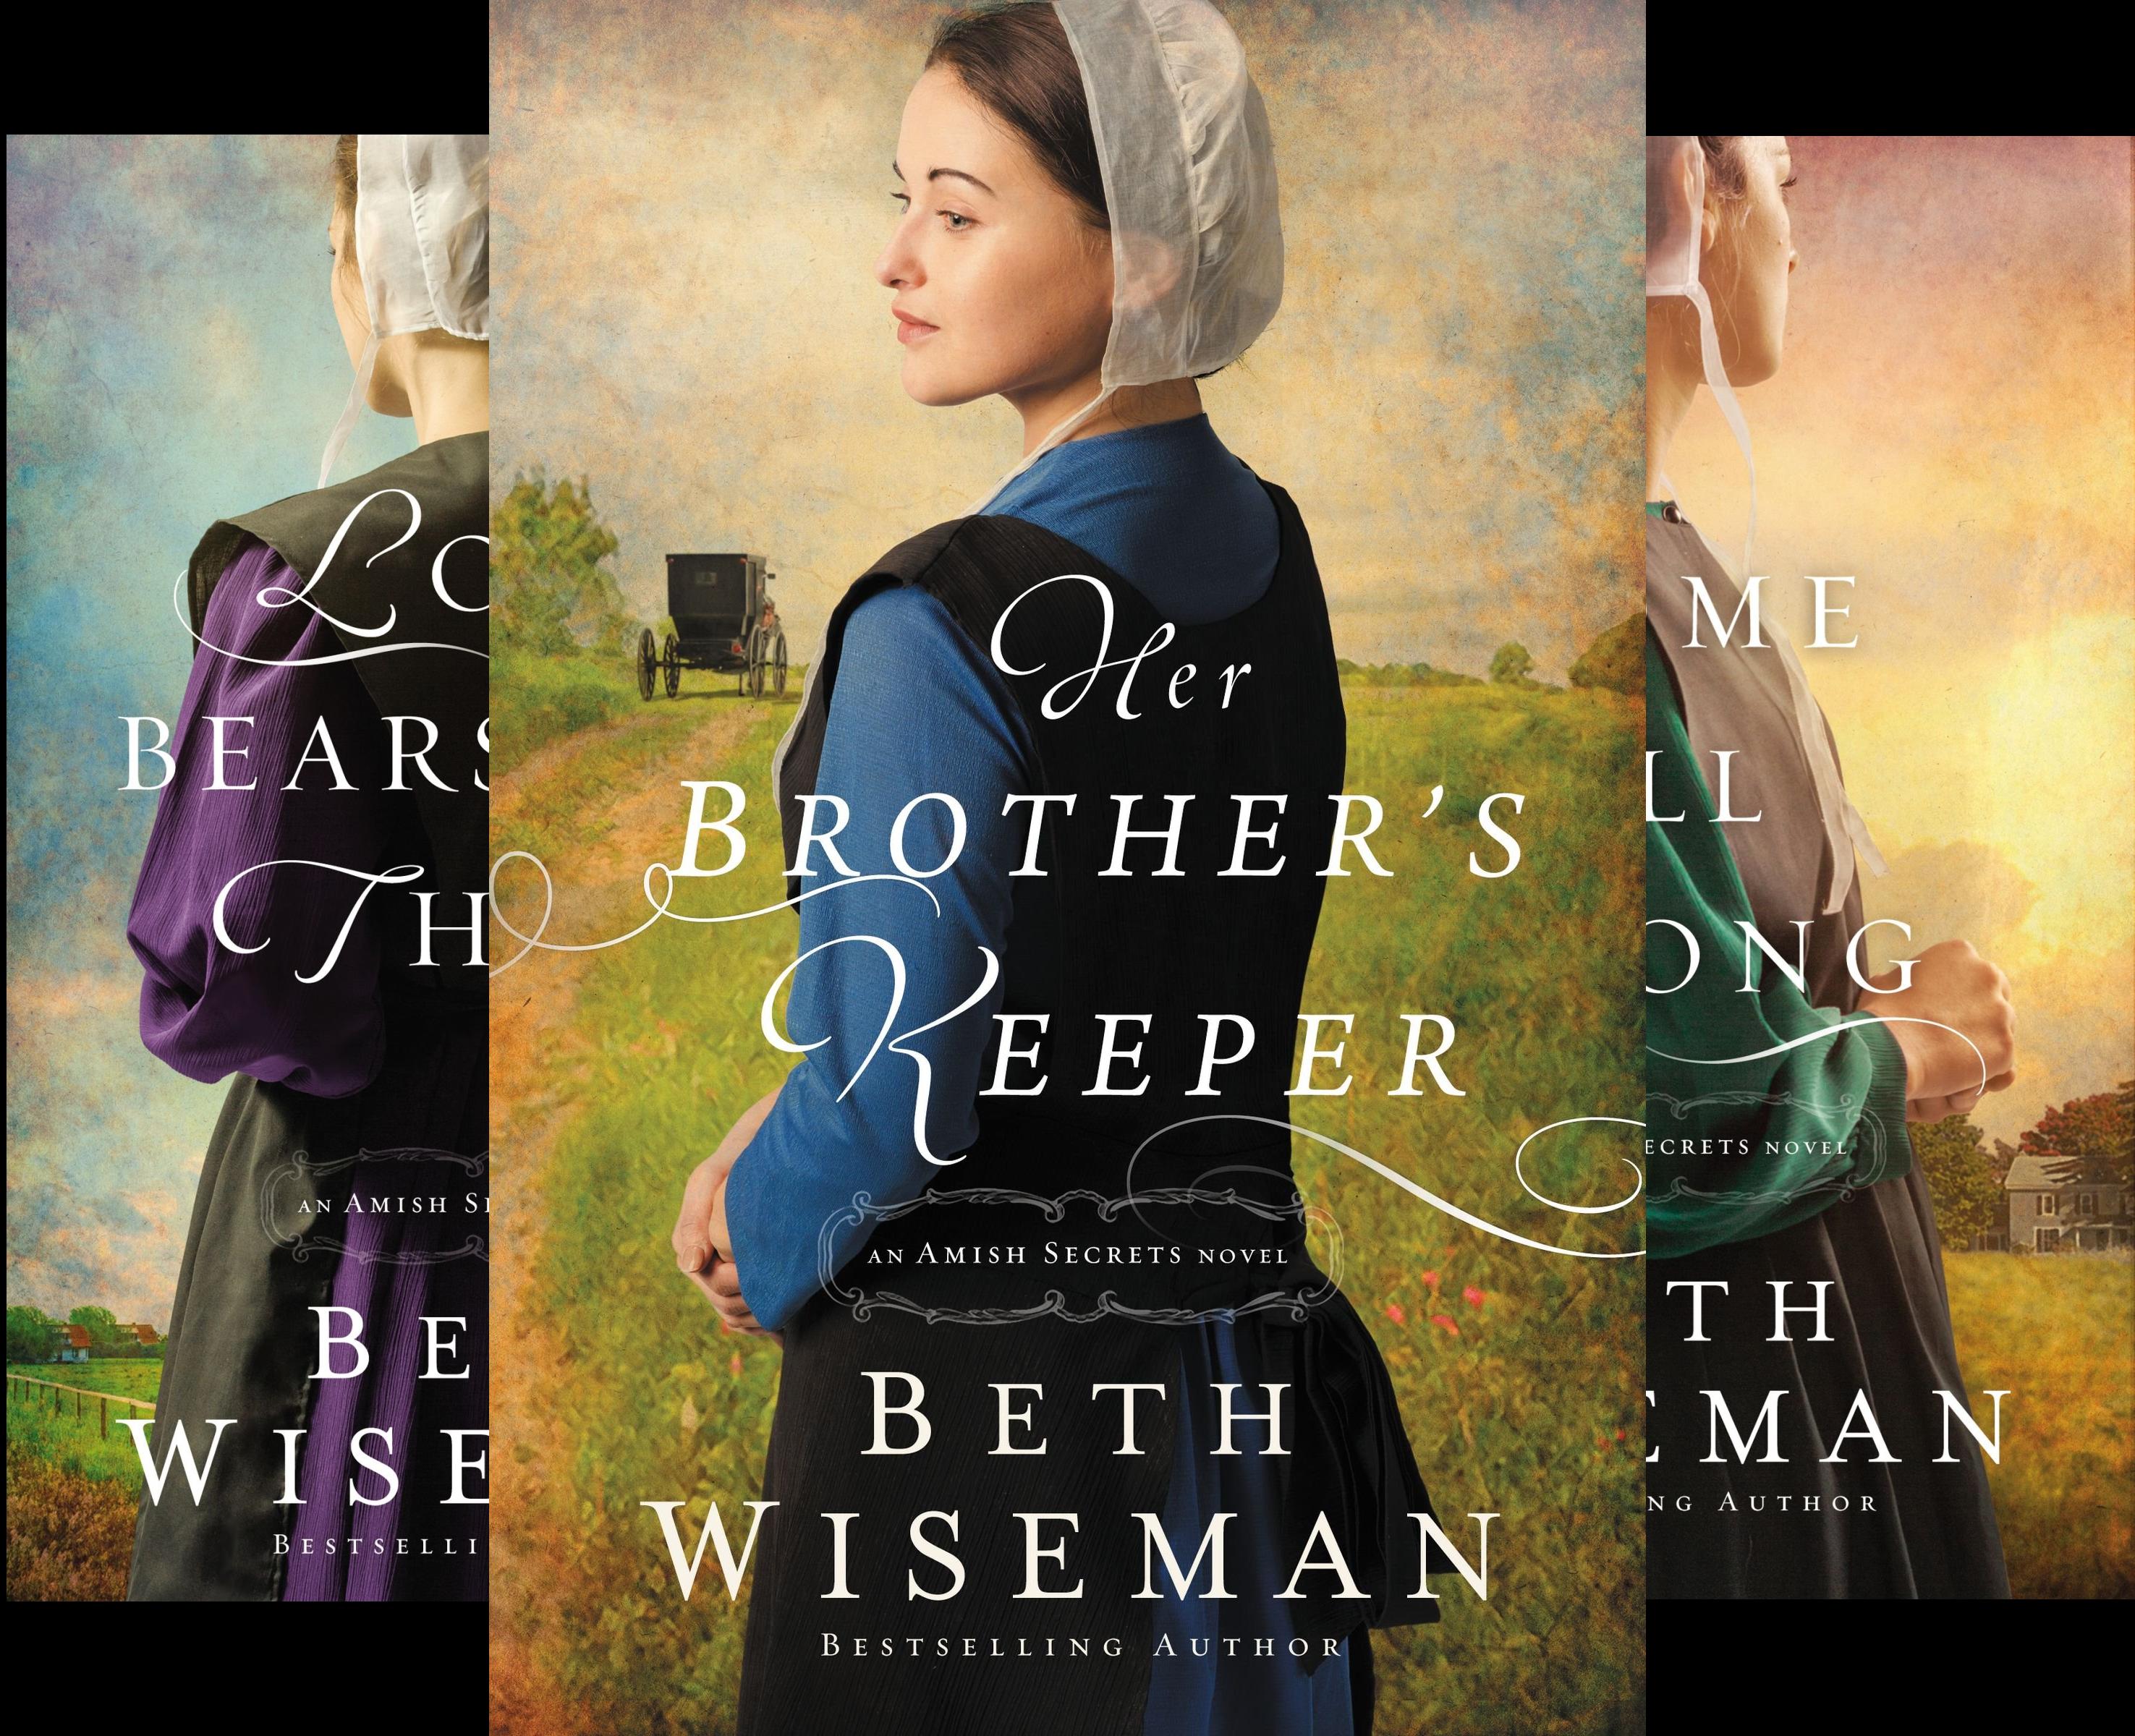 An Amish Secrets Novel (3 Book Series)